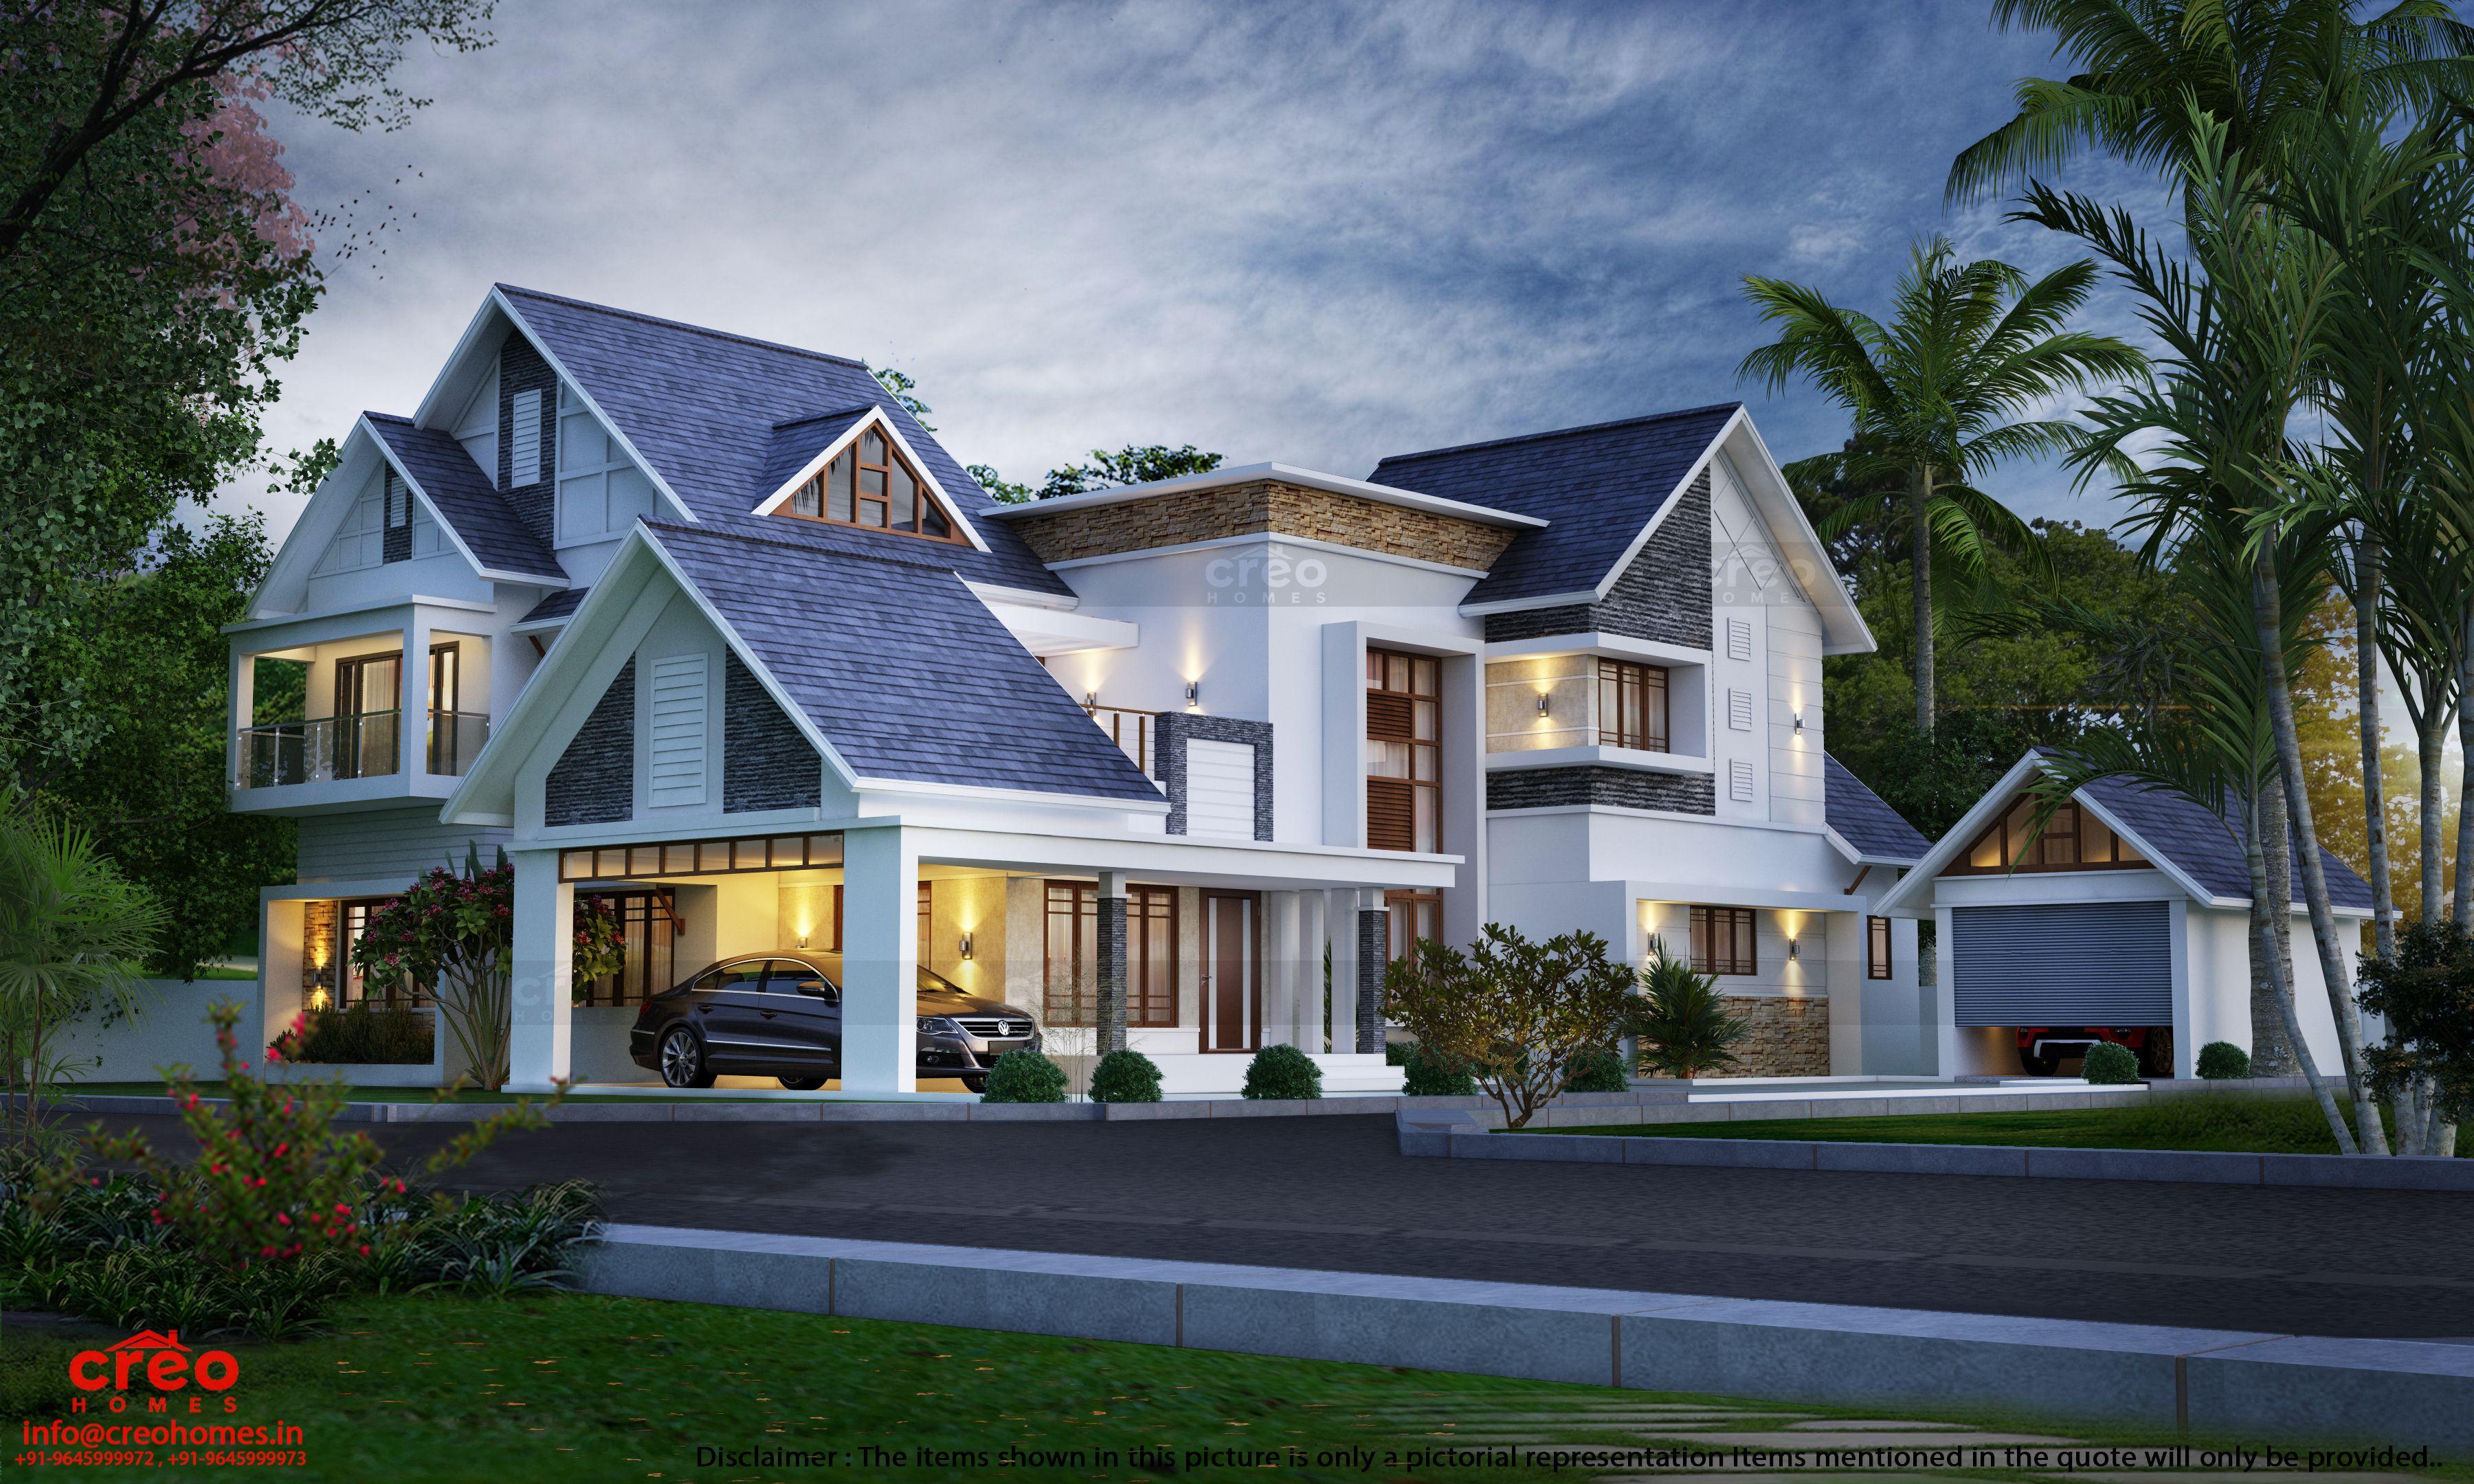 Creative Home Designs In Kerala In 2020 House Architecture